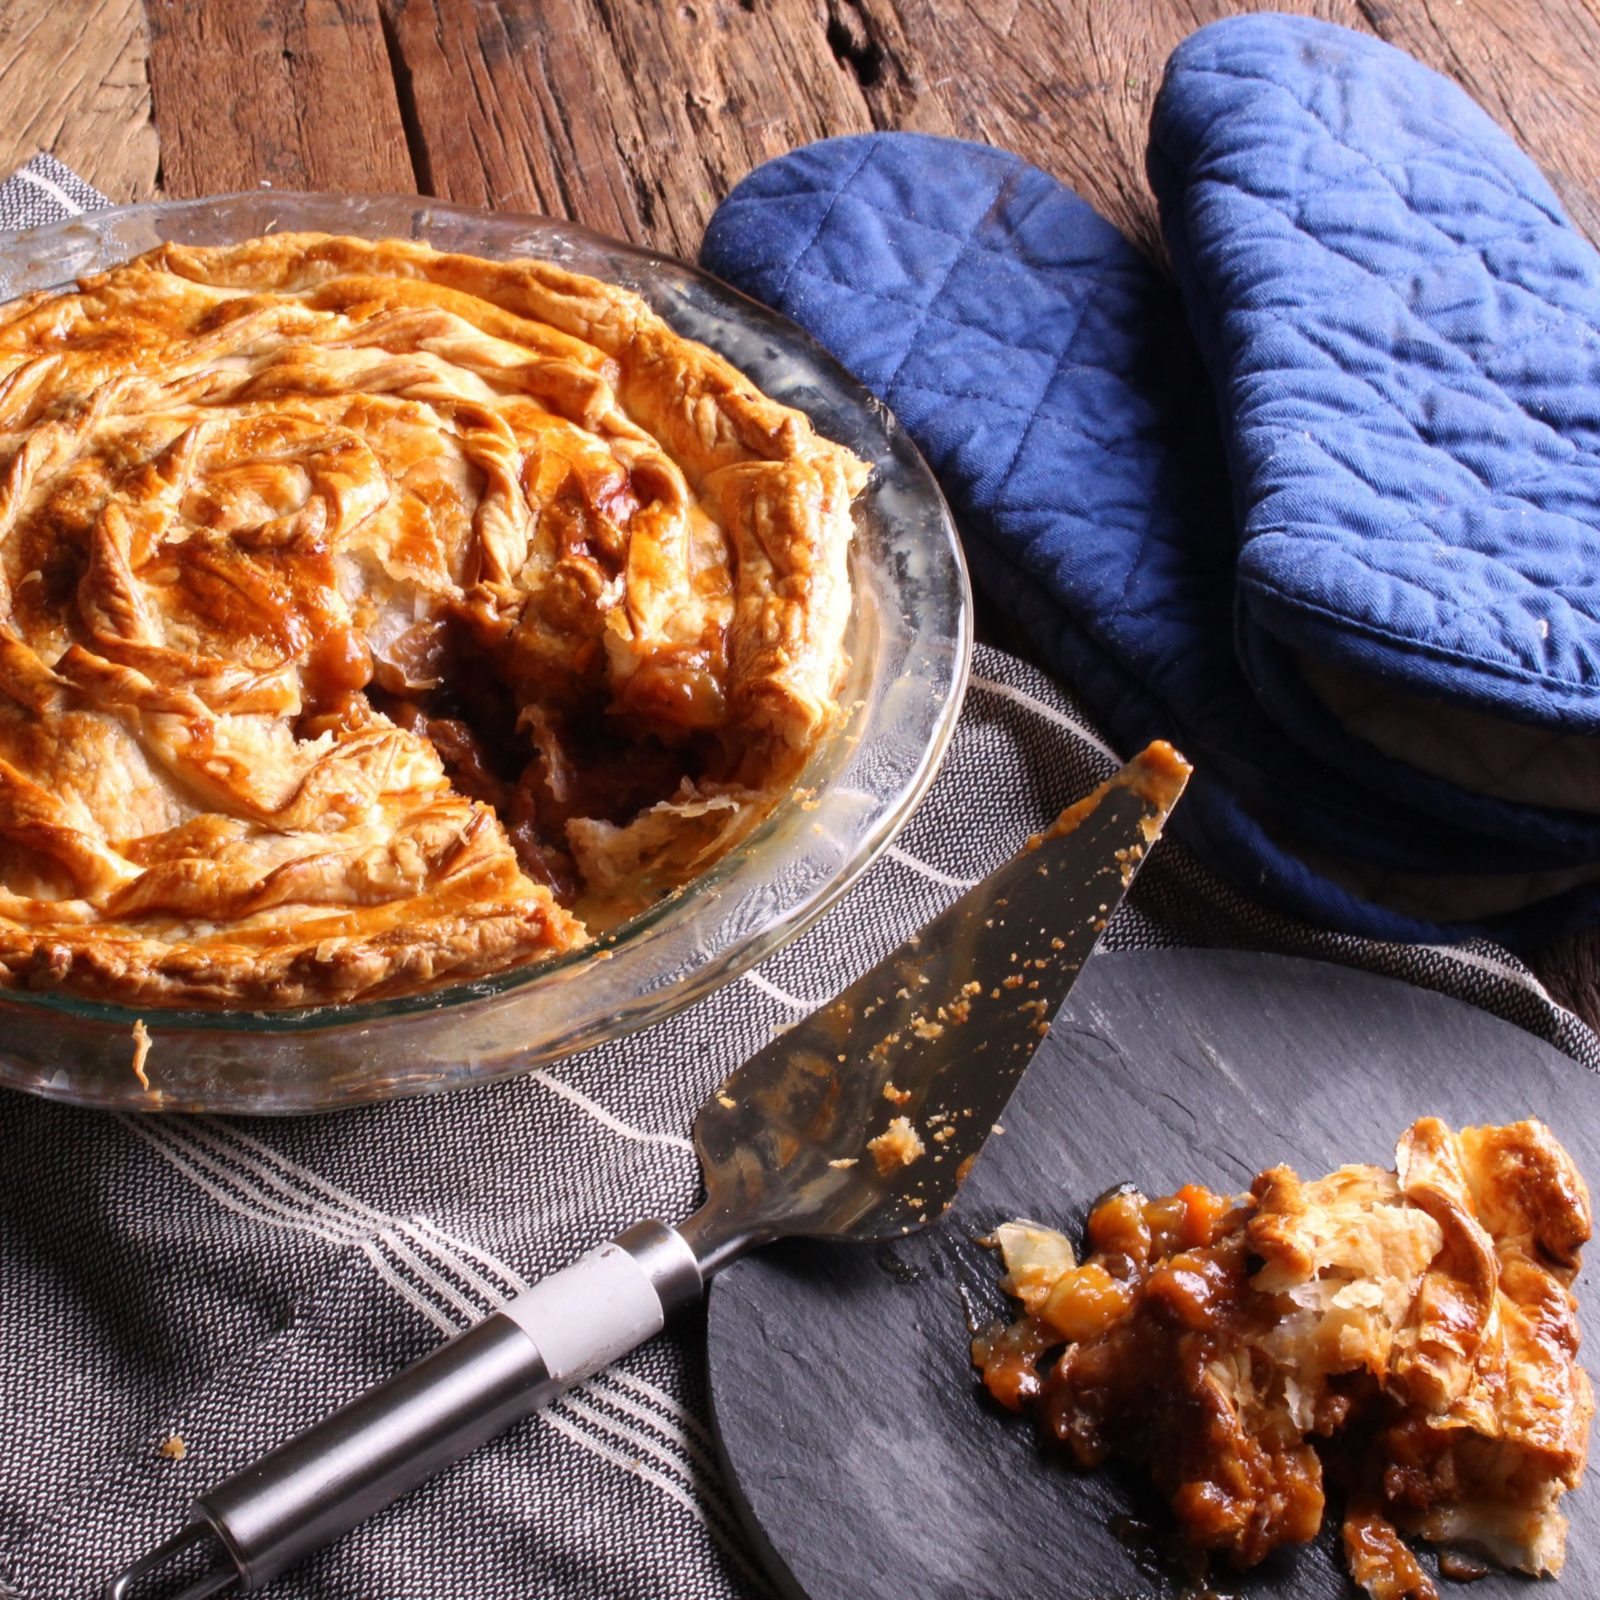 Honey Pepper Pork Pie - Three Aussie Farmers Honey Pepper Pork Steaks